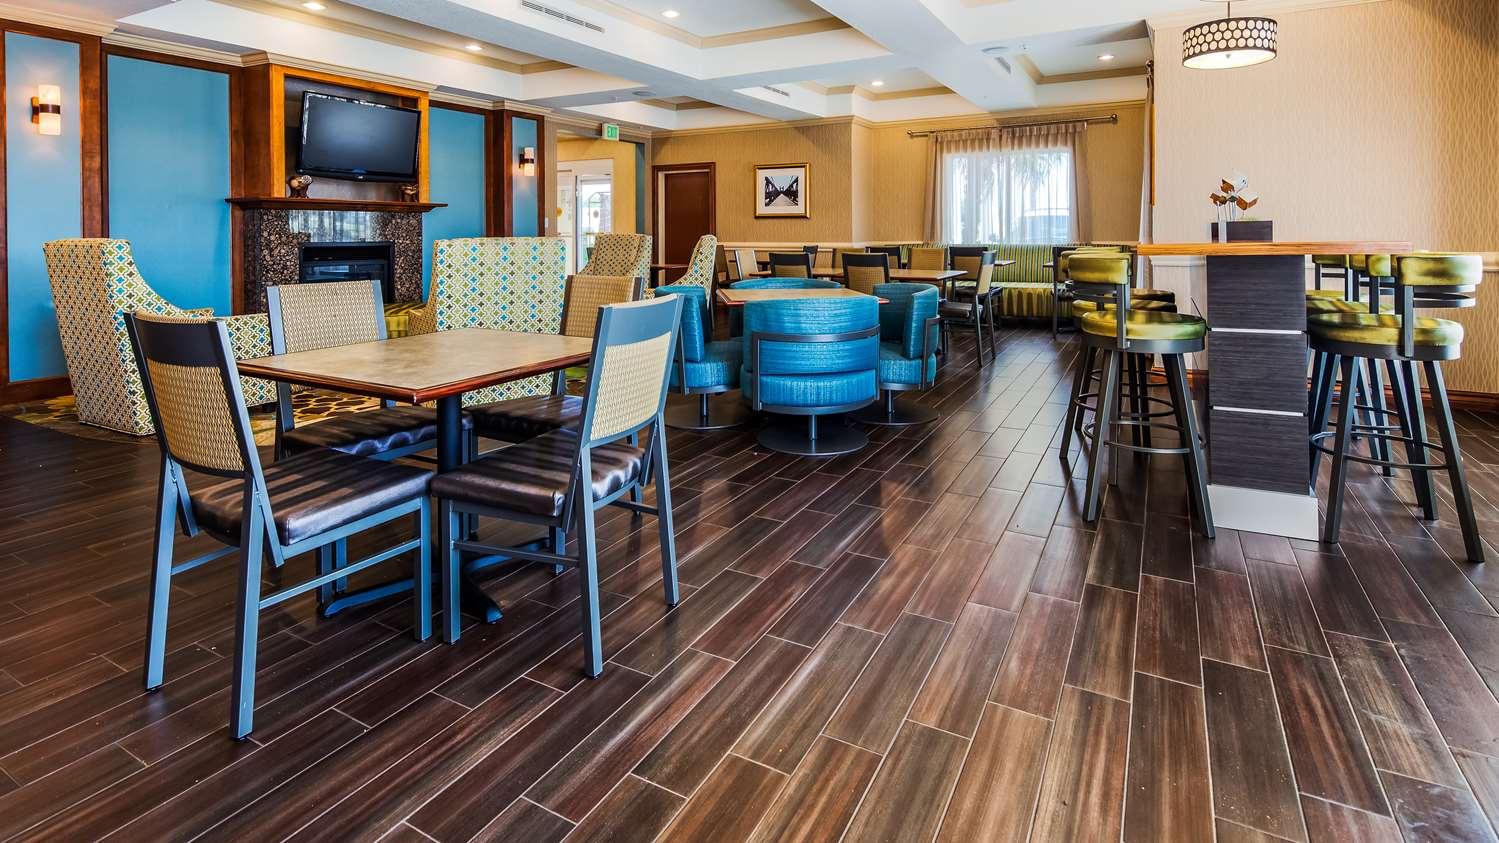 Restaurant - Best Western Plus Woodway Waco South Inn & Suites